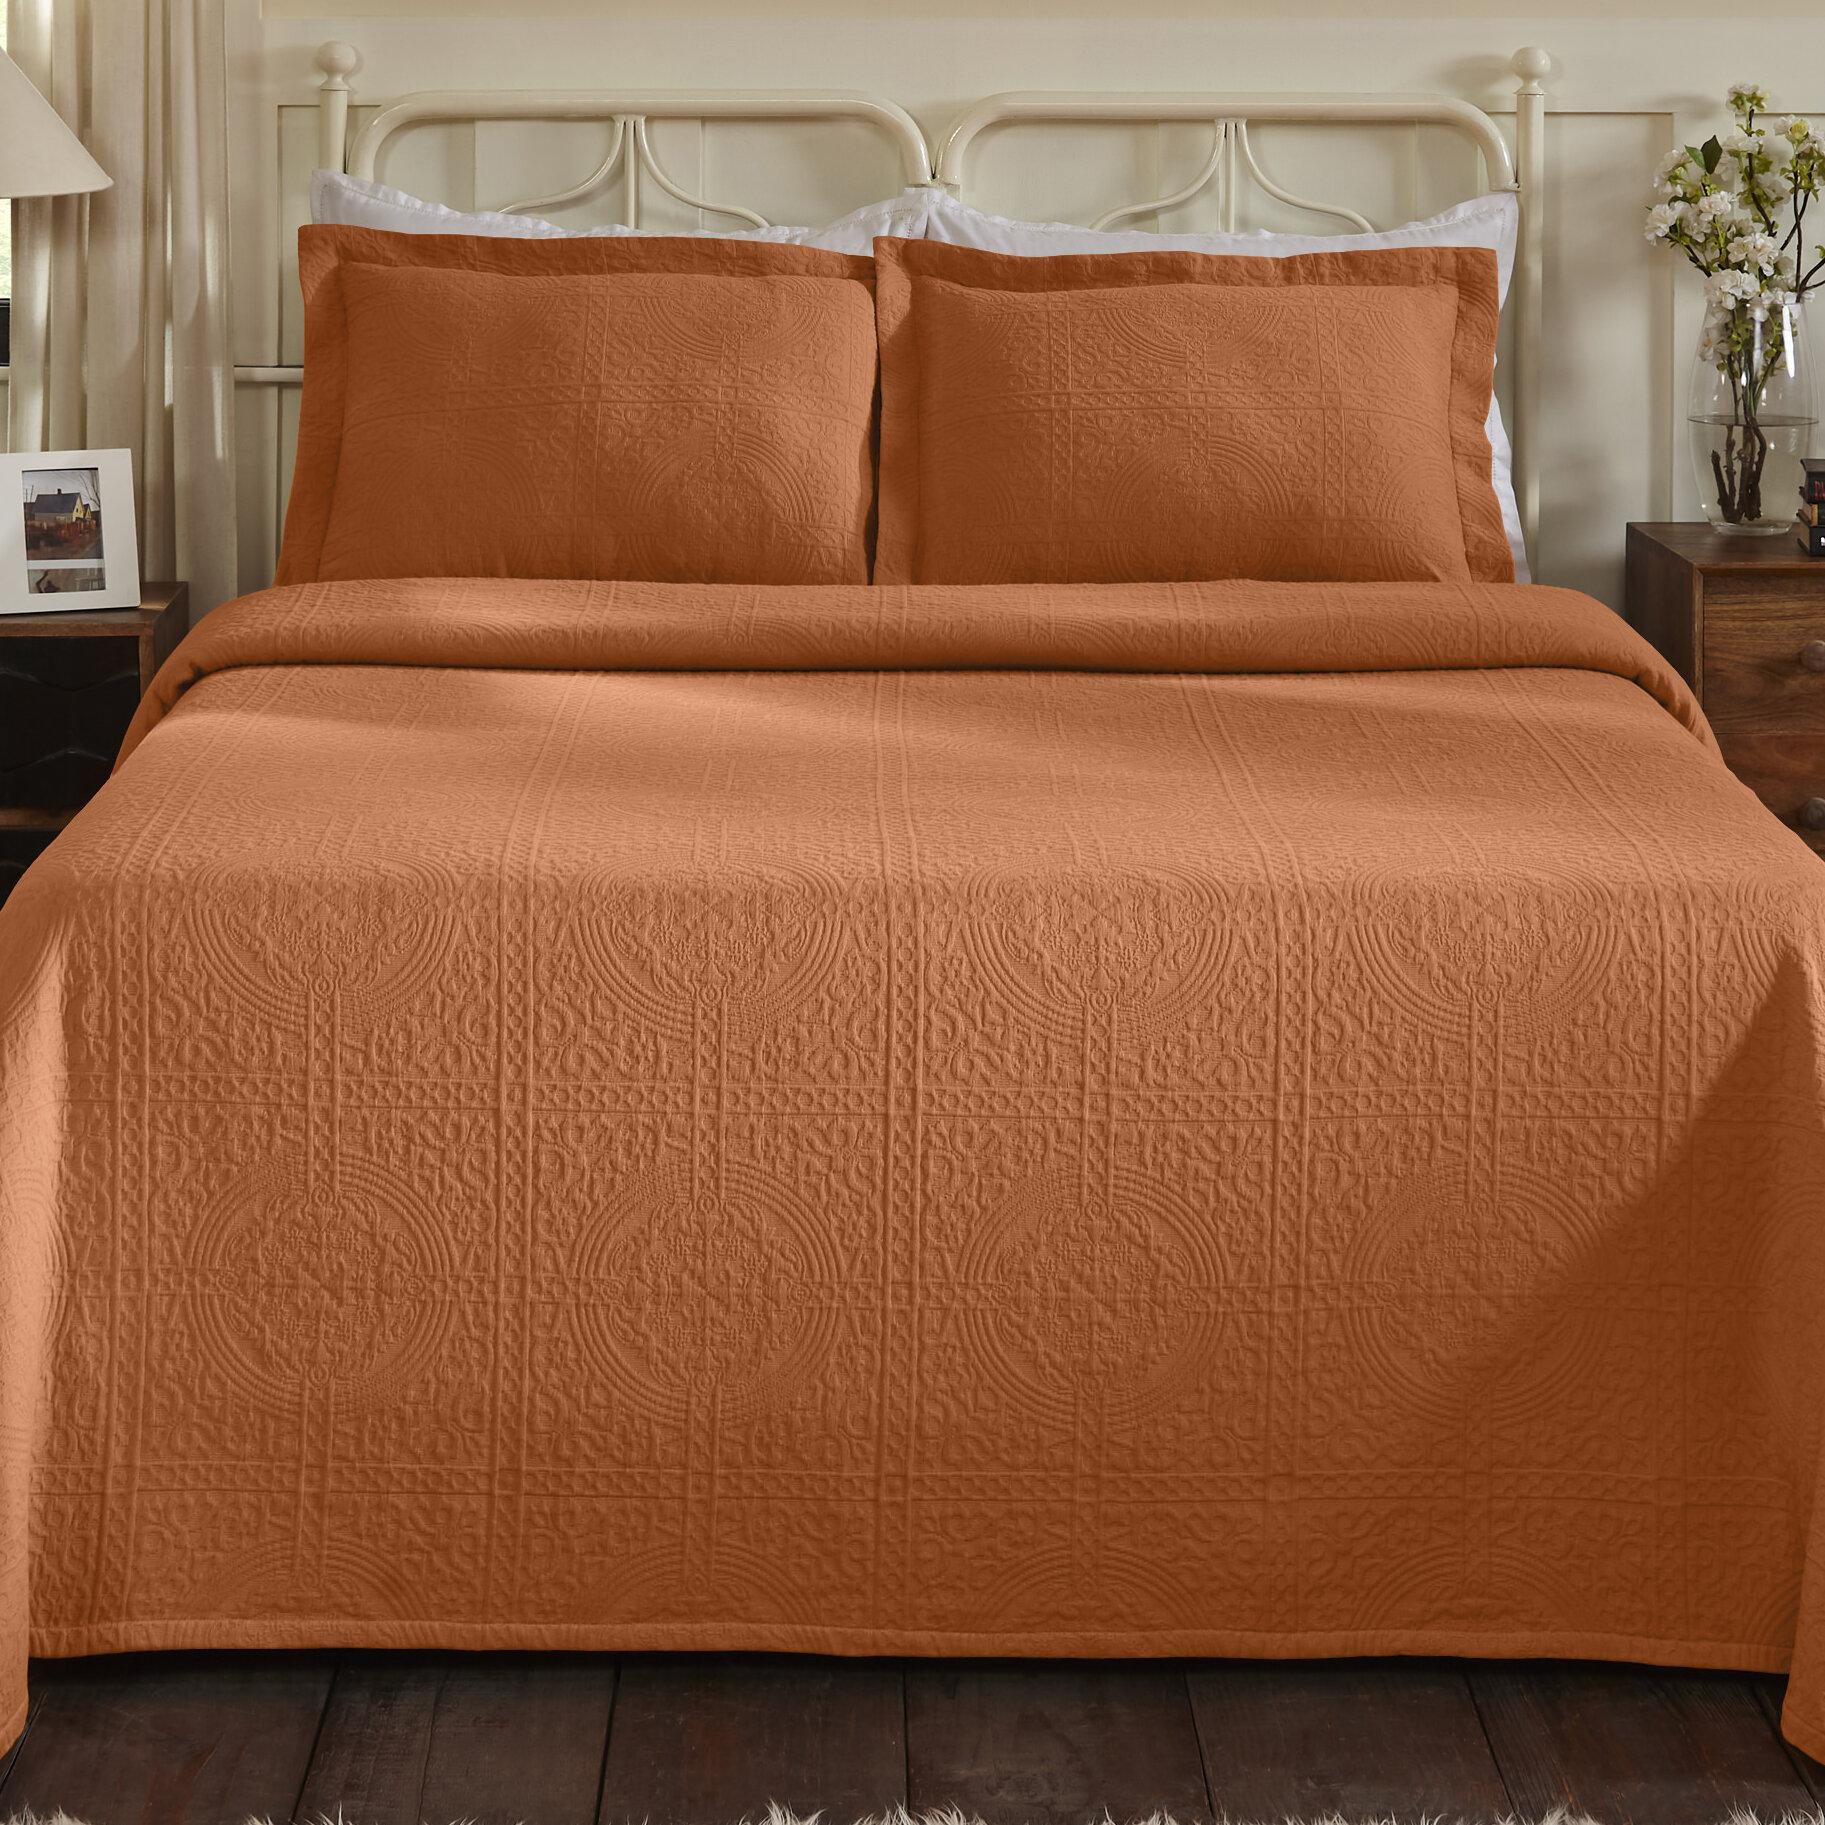 King Size Orange Bedding You Ll Love In 2021 Wayfair